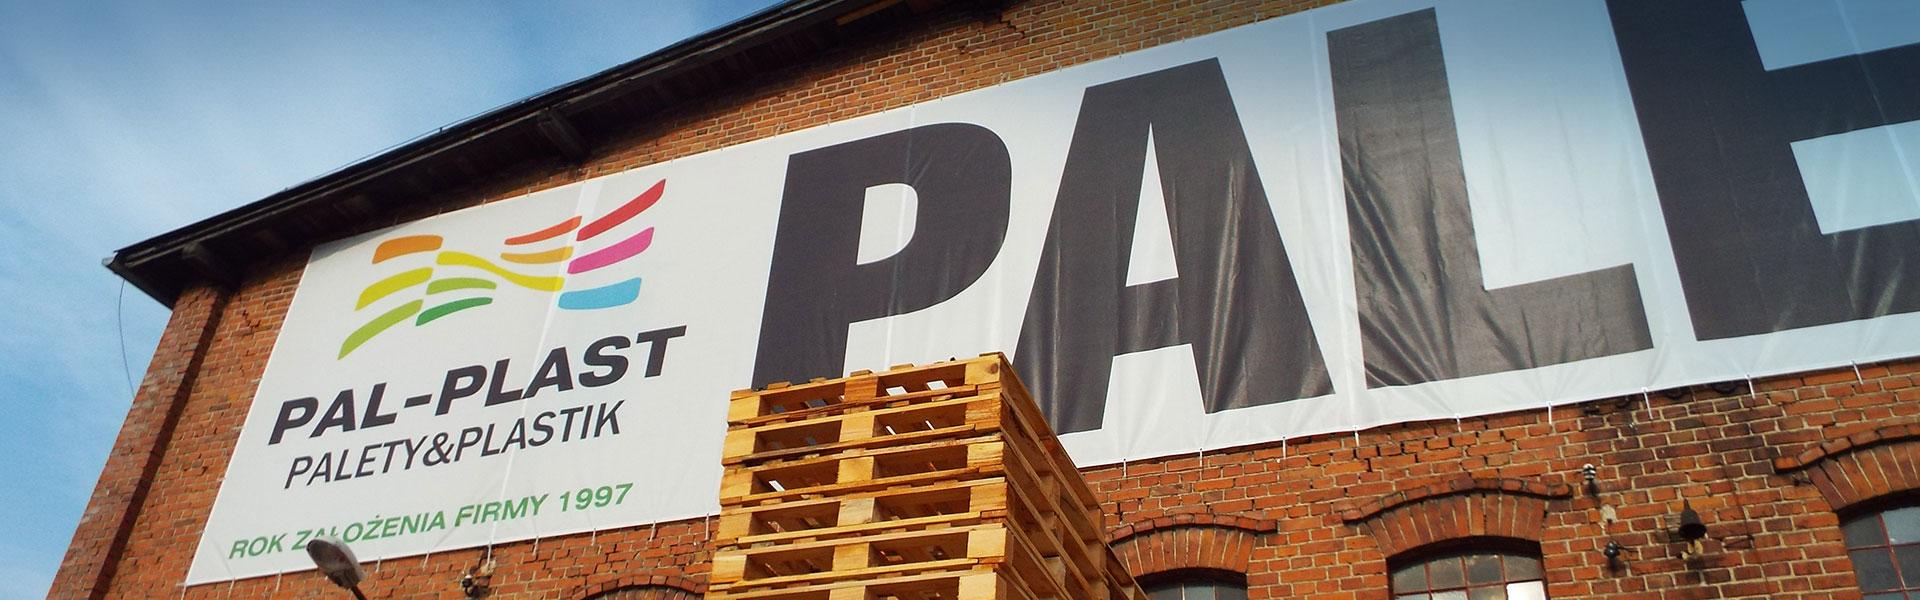 Palety Pal-Plast